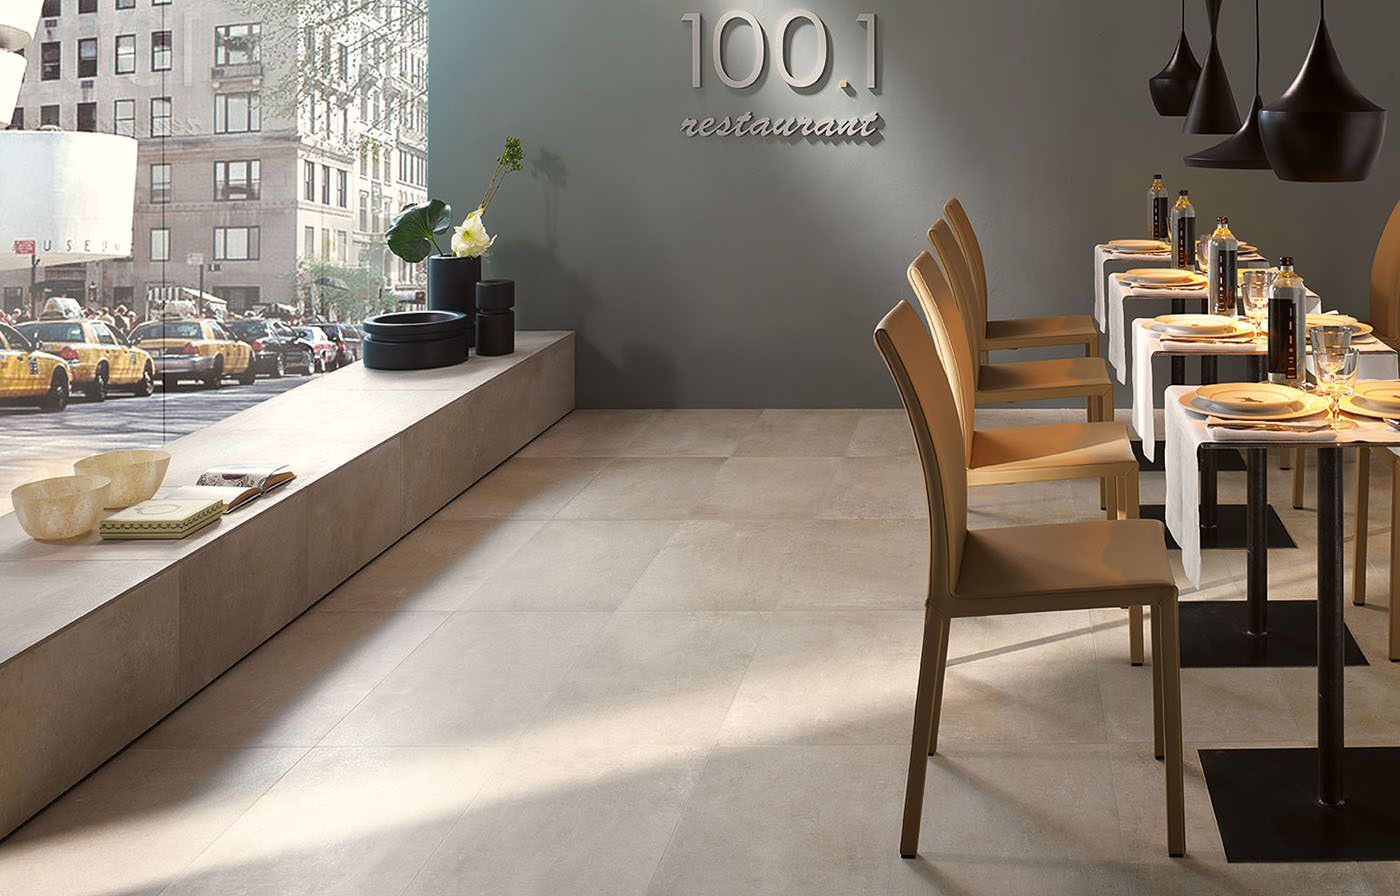 Flaviker #urban concrete greige 60x60 cm uc6030 #gres #pietra